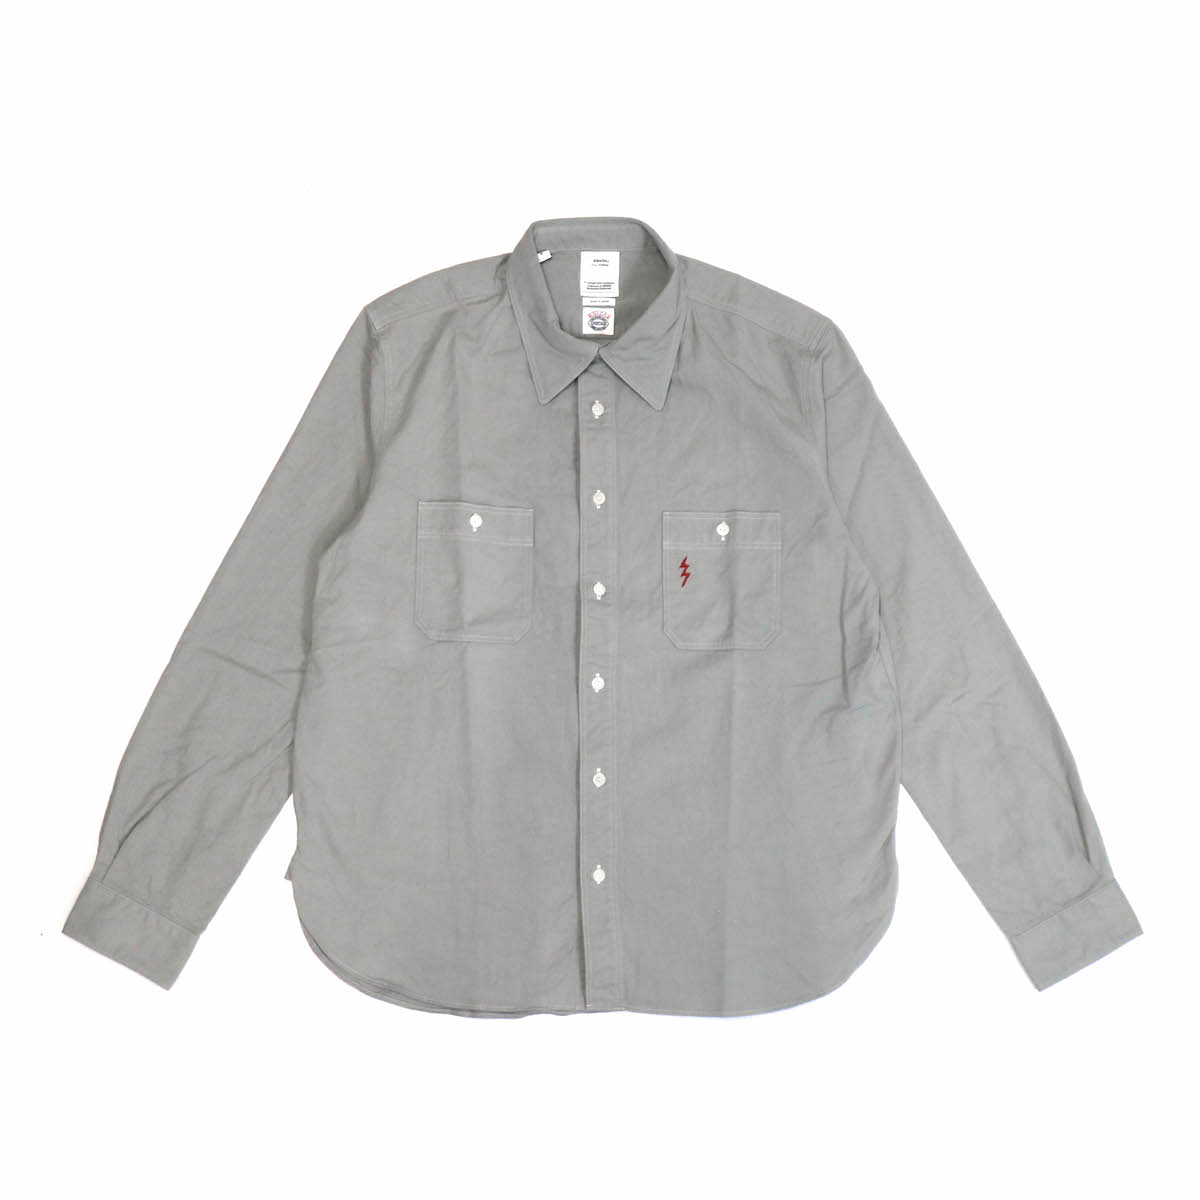 visvim / 1910 SHIRT L/S (GIZA TWILL) -gray